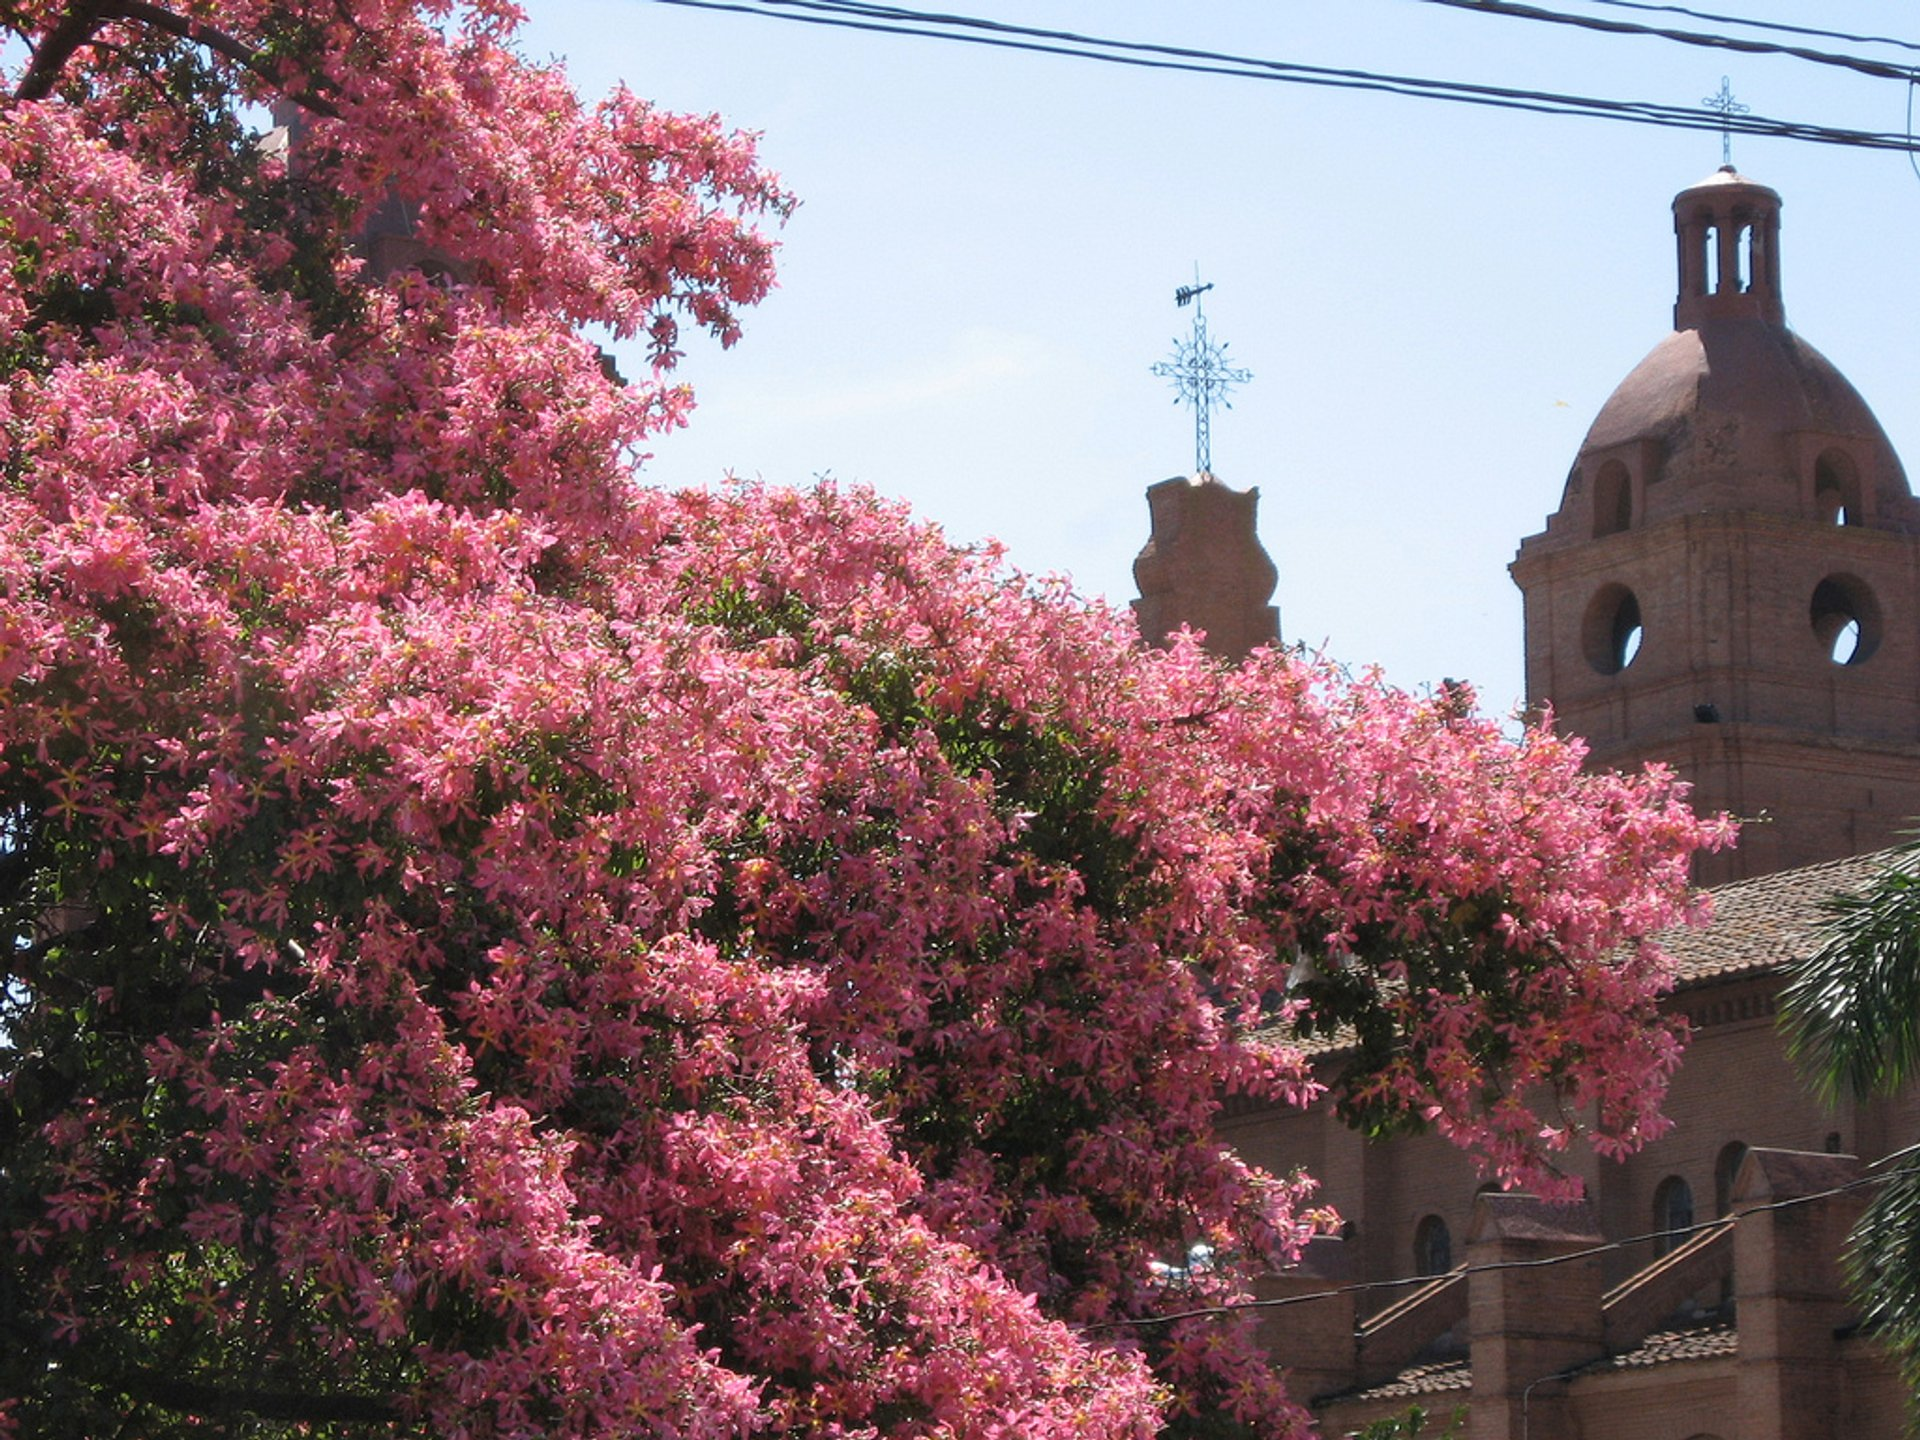 Toborochi Tree in Bloom in Bolivia - Best Season 2020